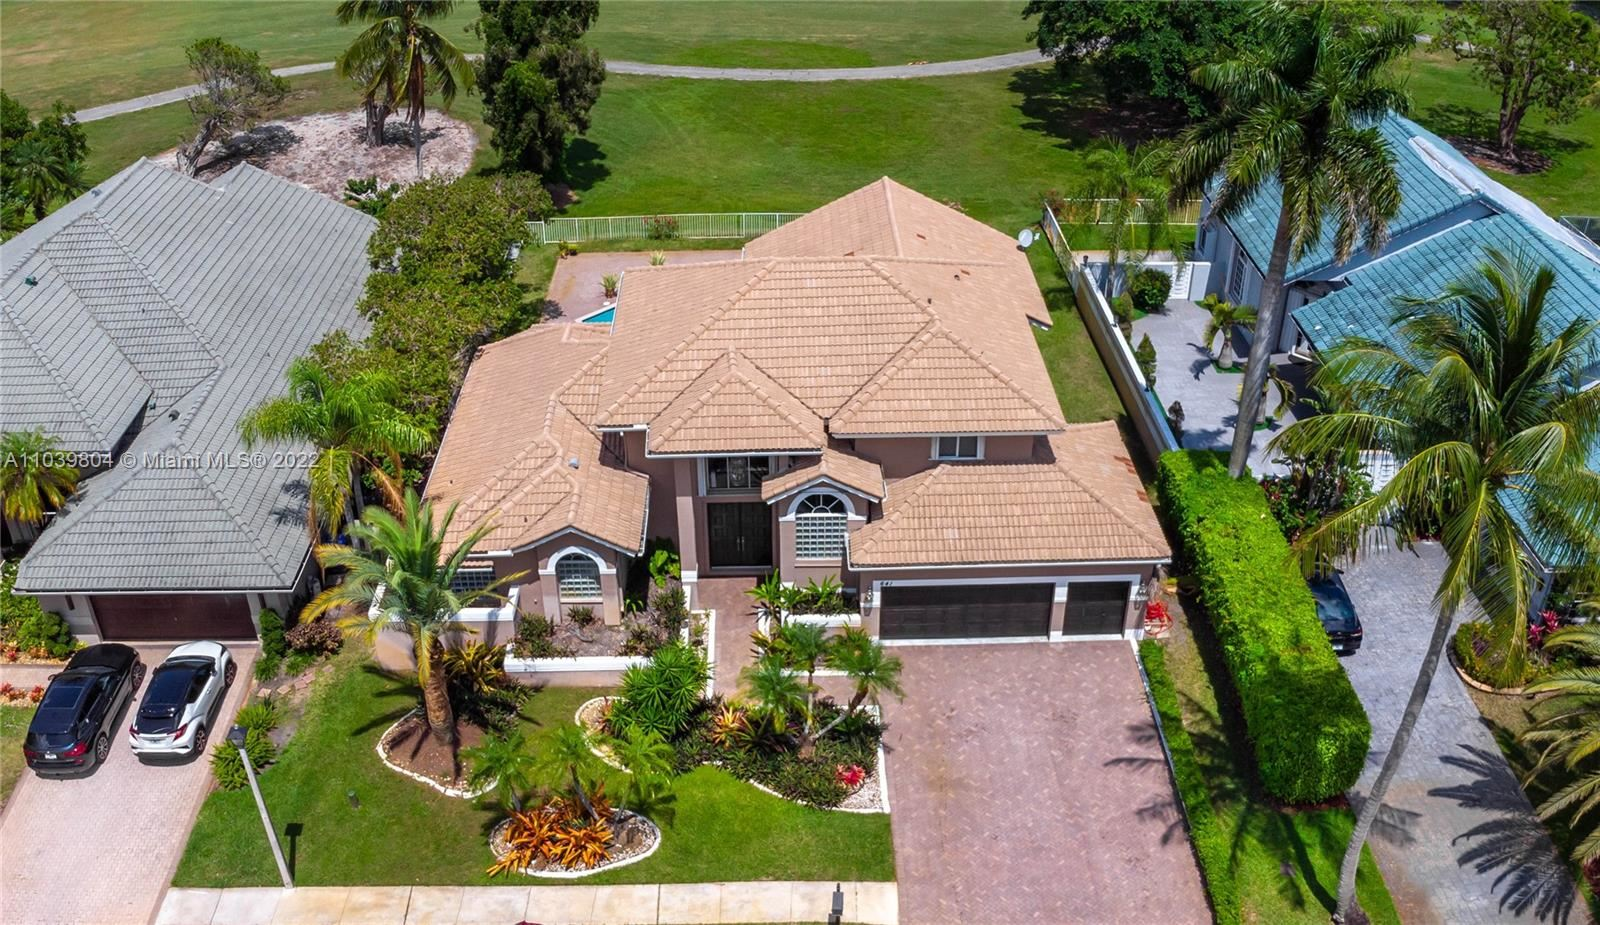 Photo of 641 E Laurel Ln E, Pembroke Pines, FL 33027 (MLS # A11039804)